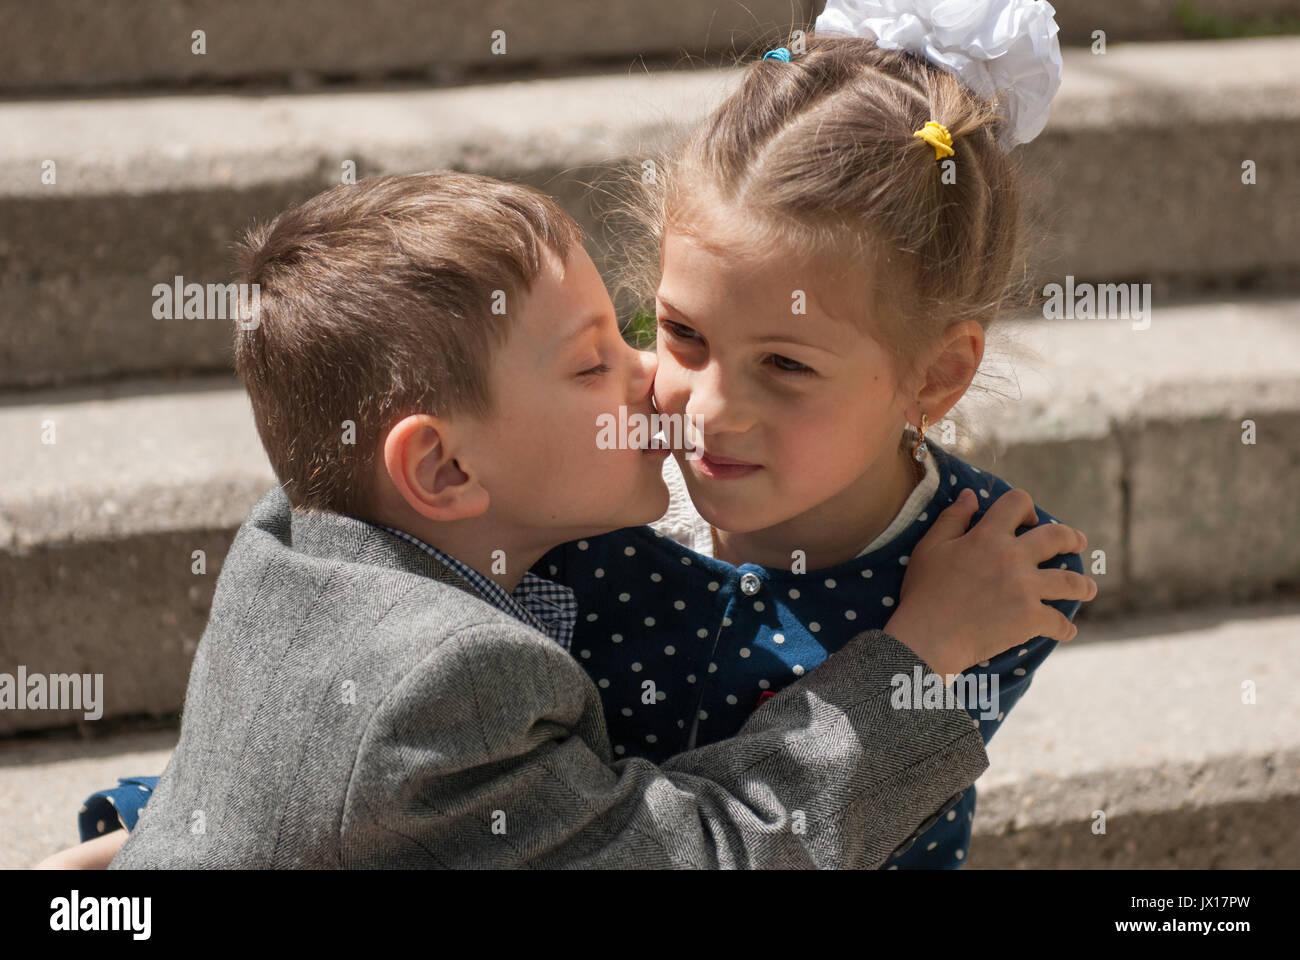 Little boy kissing an older girl stock photo 153692081 alamy little boy kissing an older girl altavistaventures Images